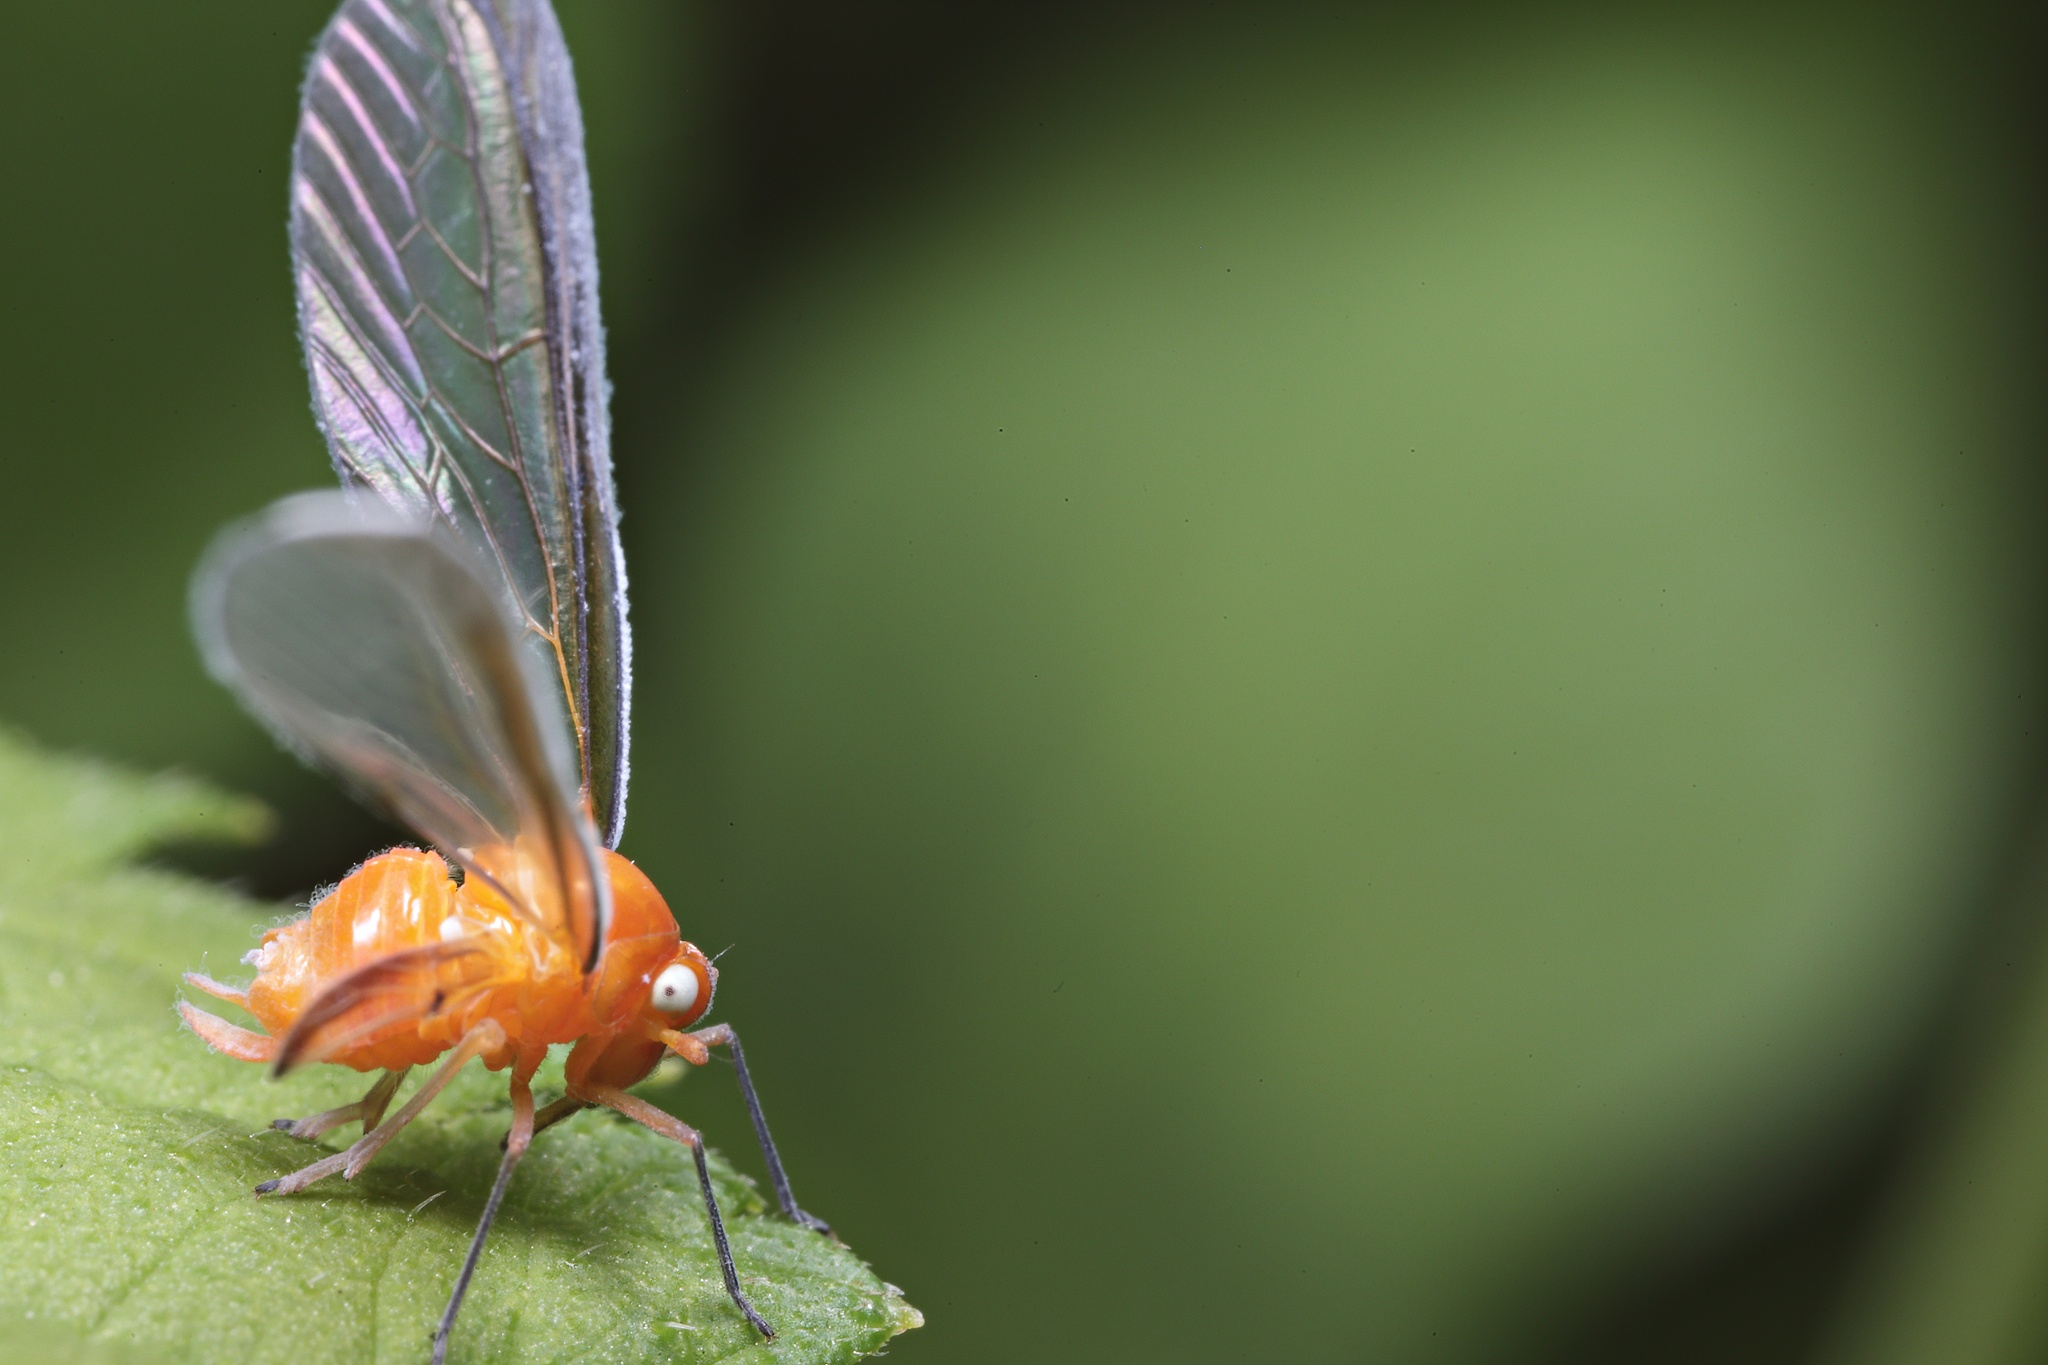 Derbid planthopper by kim_adhen